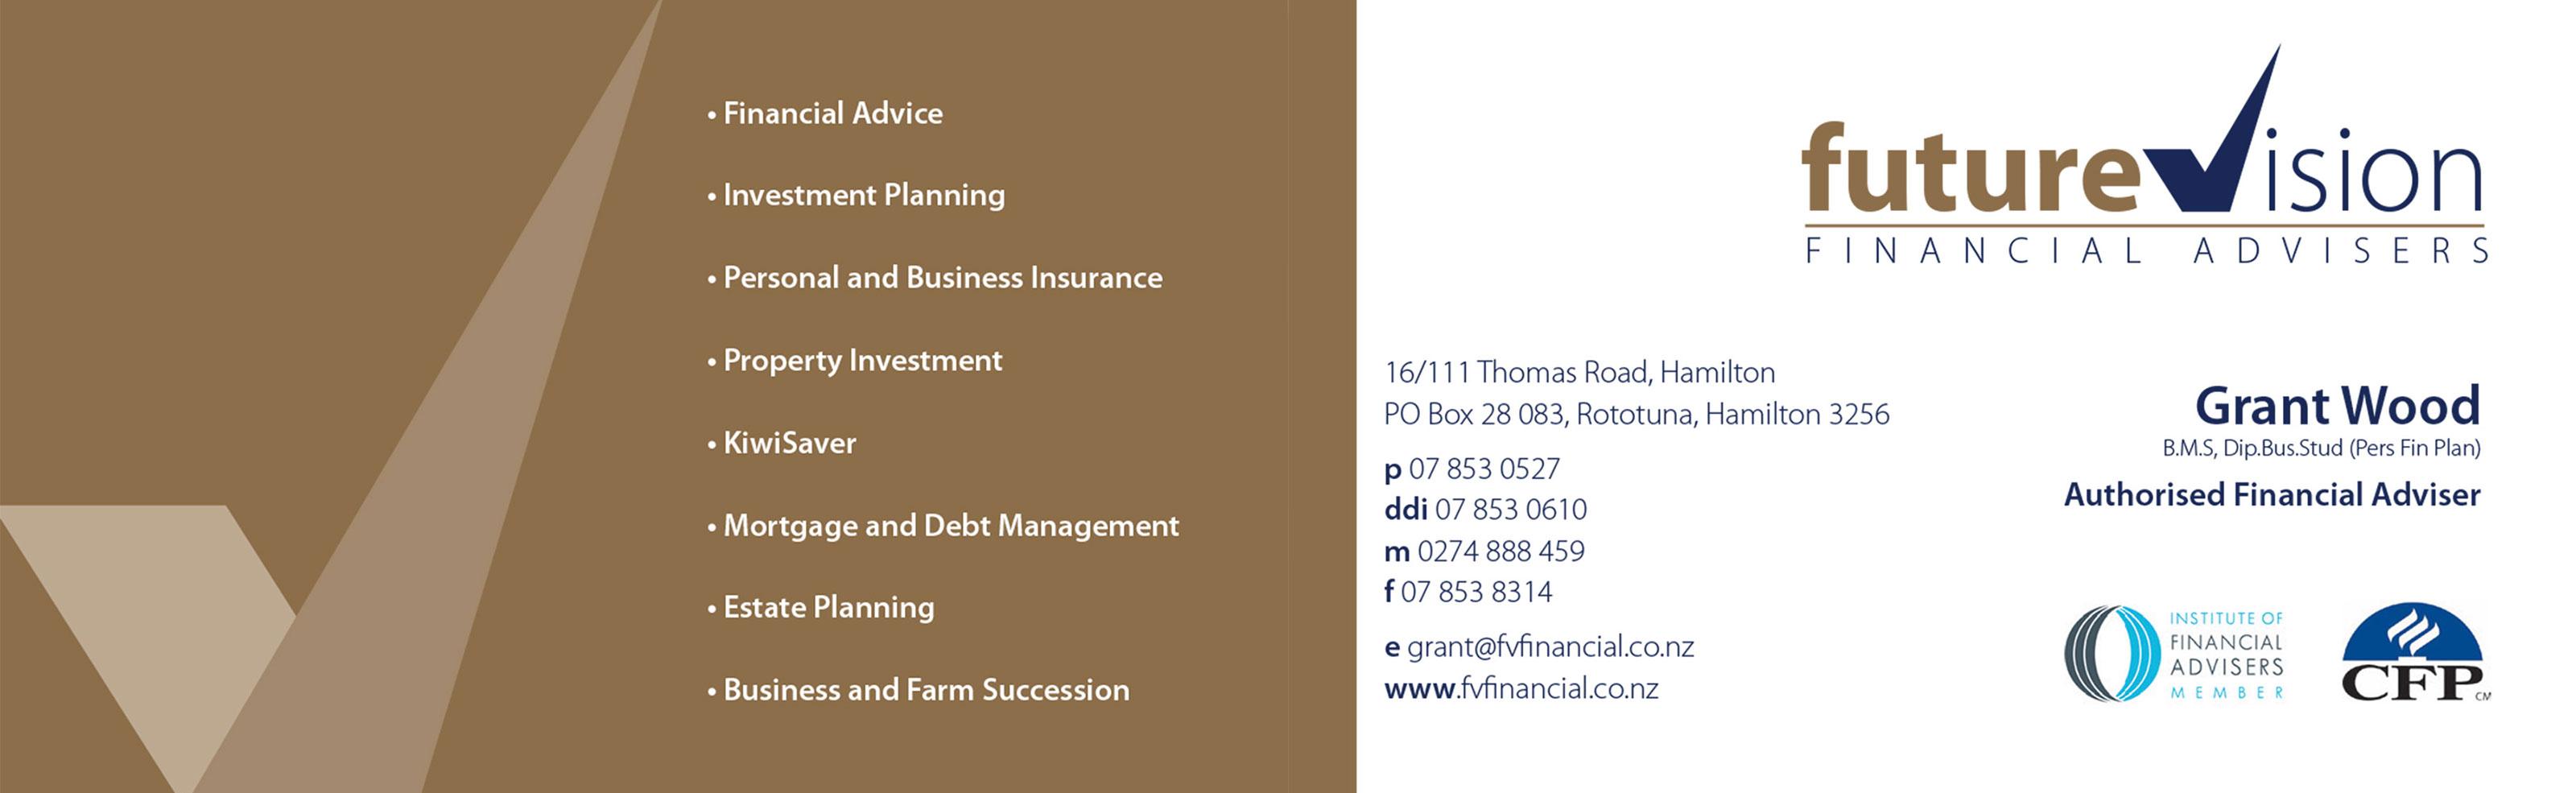 Future Vision Financial Advisors